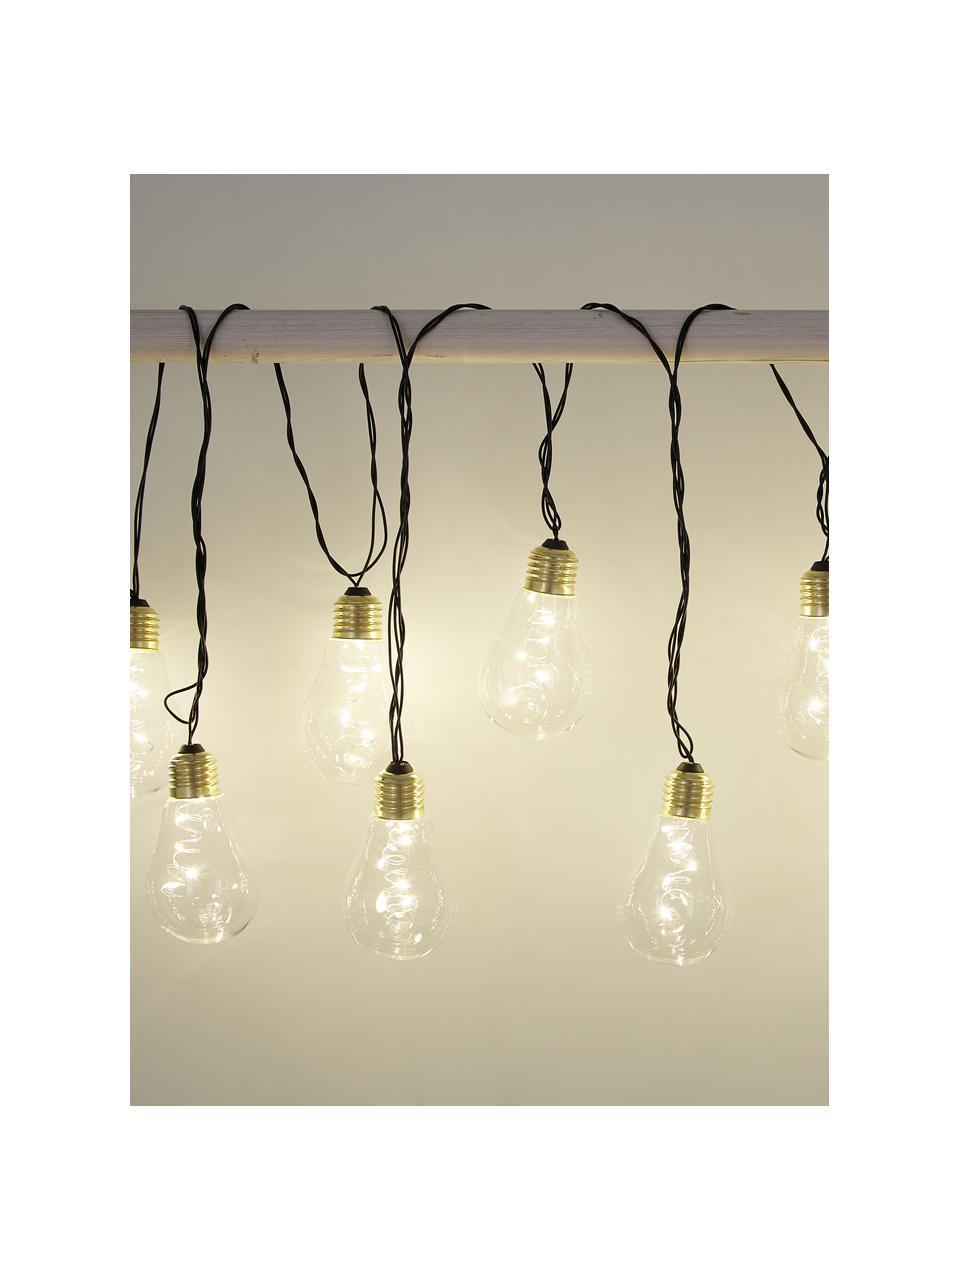 LED-Lichterkette Bulb, 360 cm, 10 Lampions, Leuchtmittel: Transparent, Goldfarben Kabel: Schwarz, L 360 cm